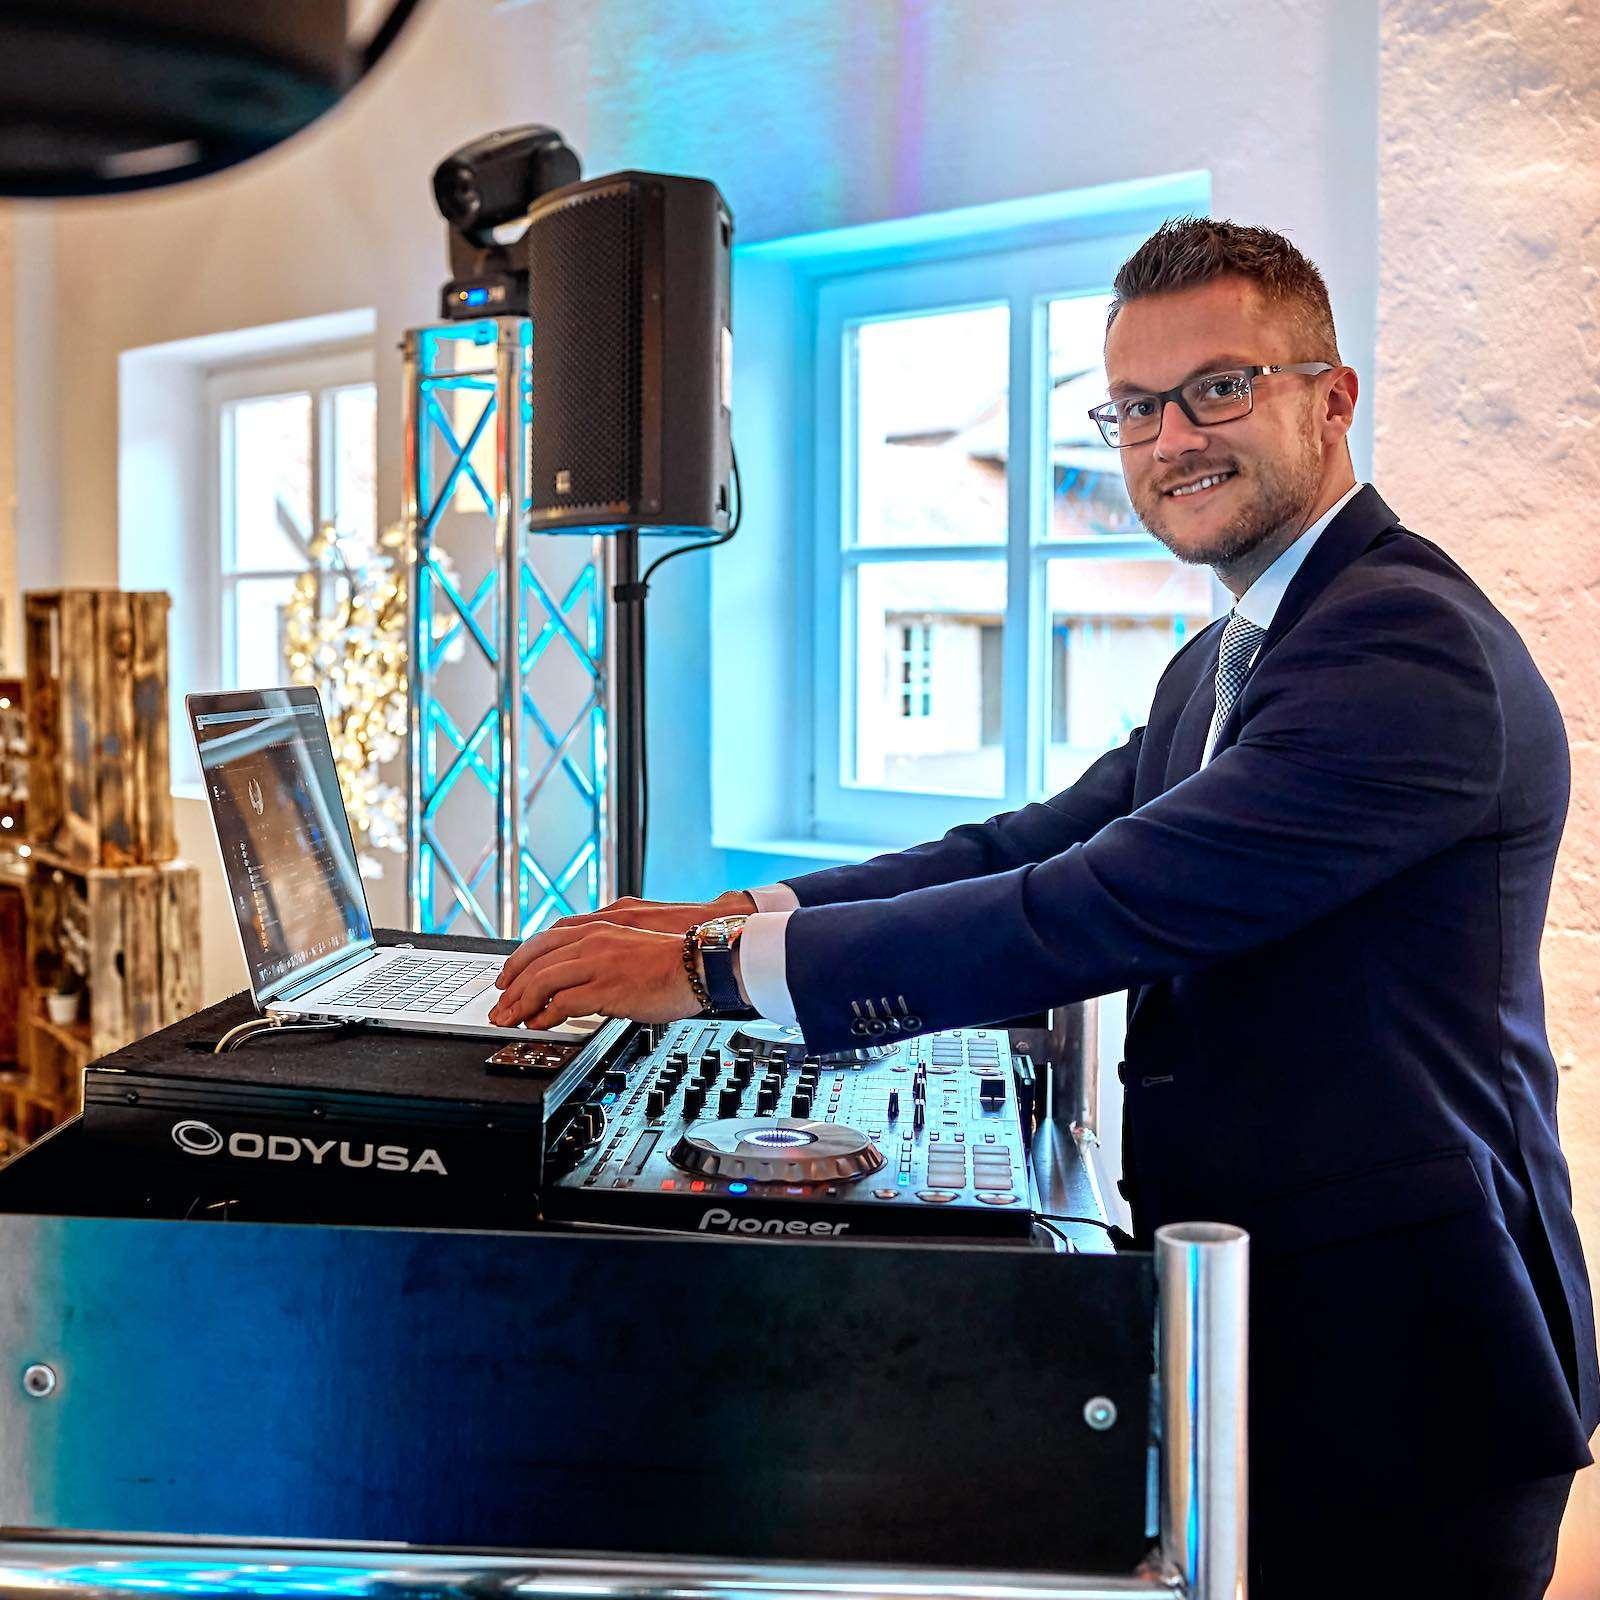 DJ | Hannover | Buchen | Discjockey | Daniel | Paar | DJ | Firmenfeier | Messe | DJ | Event | DJ | Geburtstag | DJ | Service | DJ | Kosten | DJ | Mieten | DJ | Anfragen | DJ | Agentur | Lehmann | Eventservice